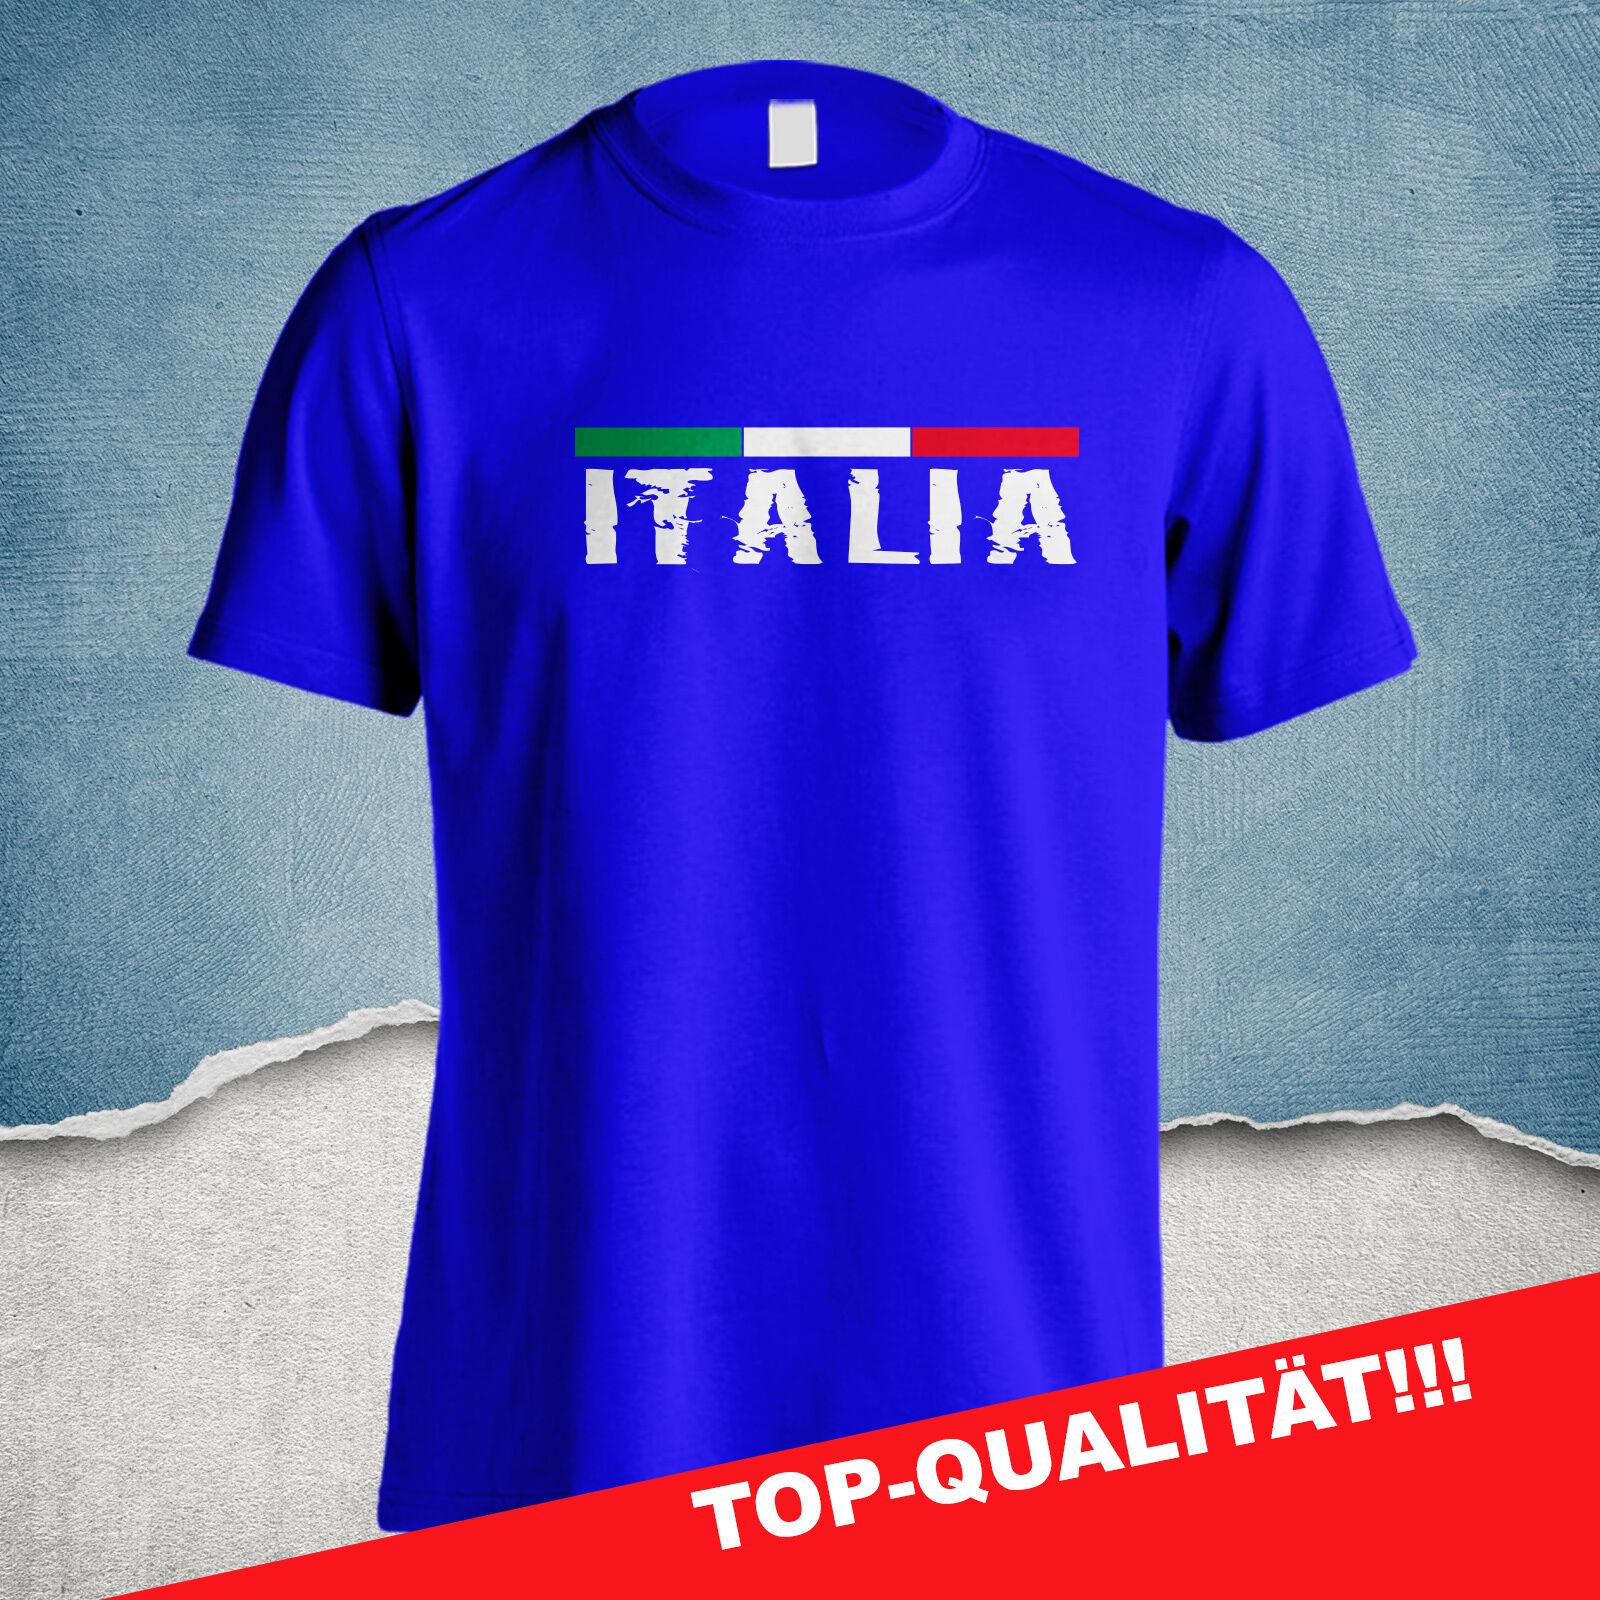 ITALIA T-SHIRT ITALIEN SQUADRA AZZURRA HOCHWERTIGE VERARBEITUNG S - 4XL ROM